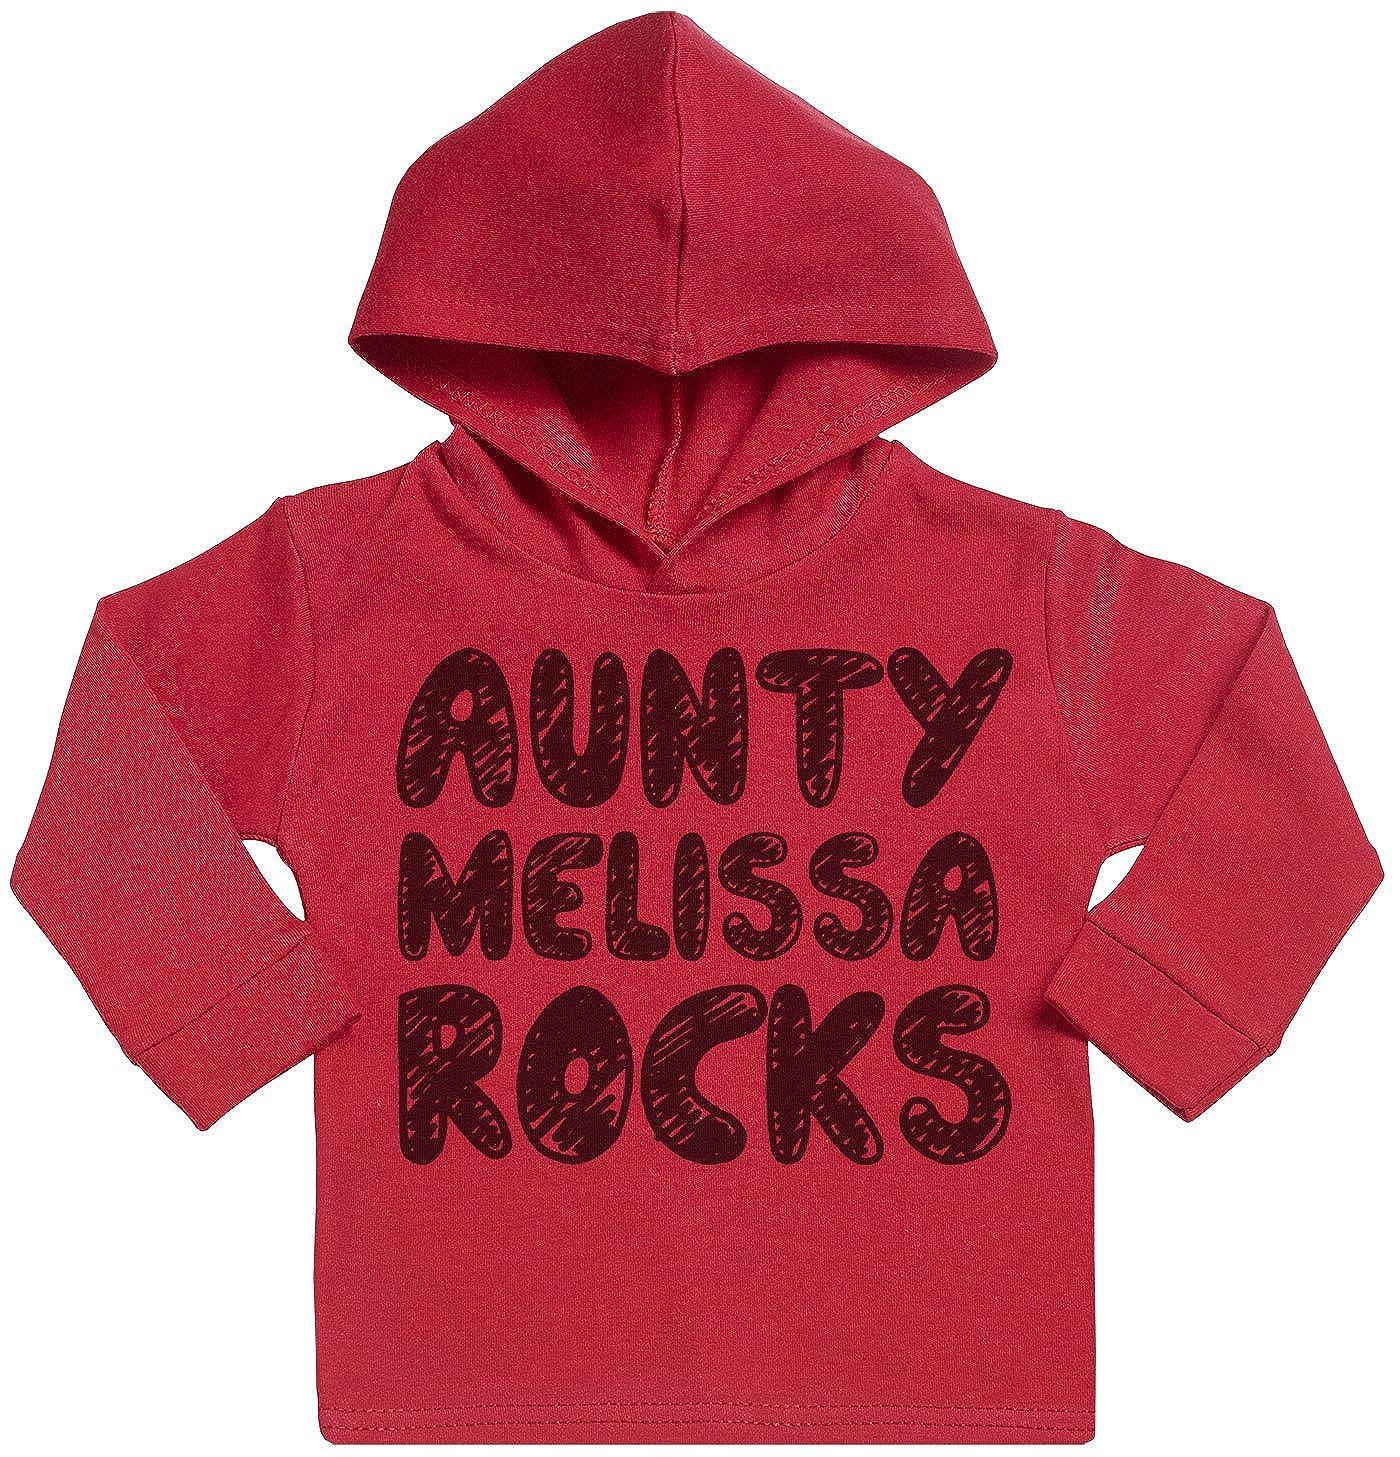 SR Personalised Aunty Rocks Custom Print Cotton Baby Hoodie Personalised Baby Clothing Personalised Baby Gift